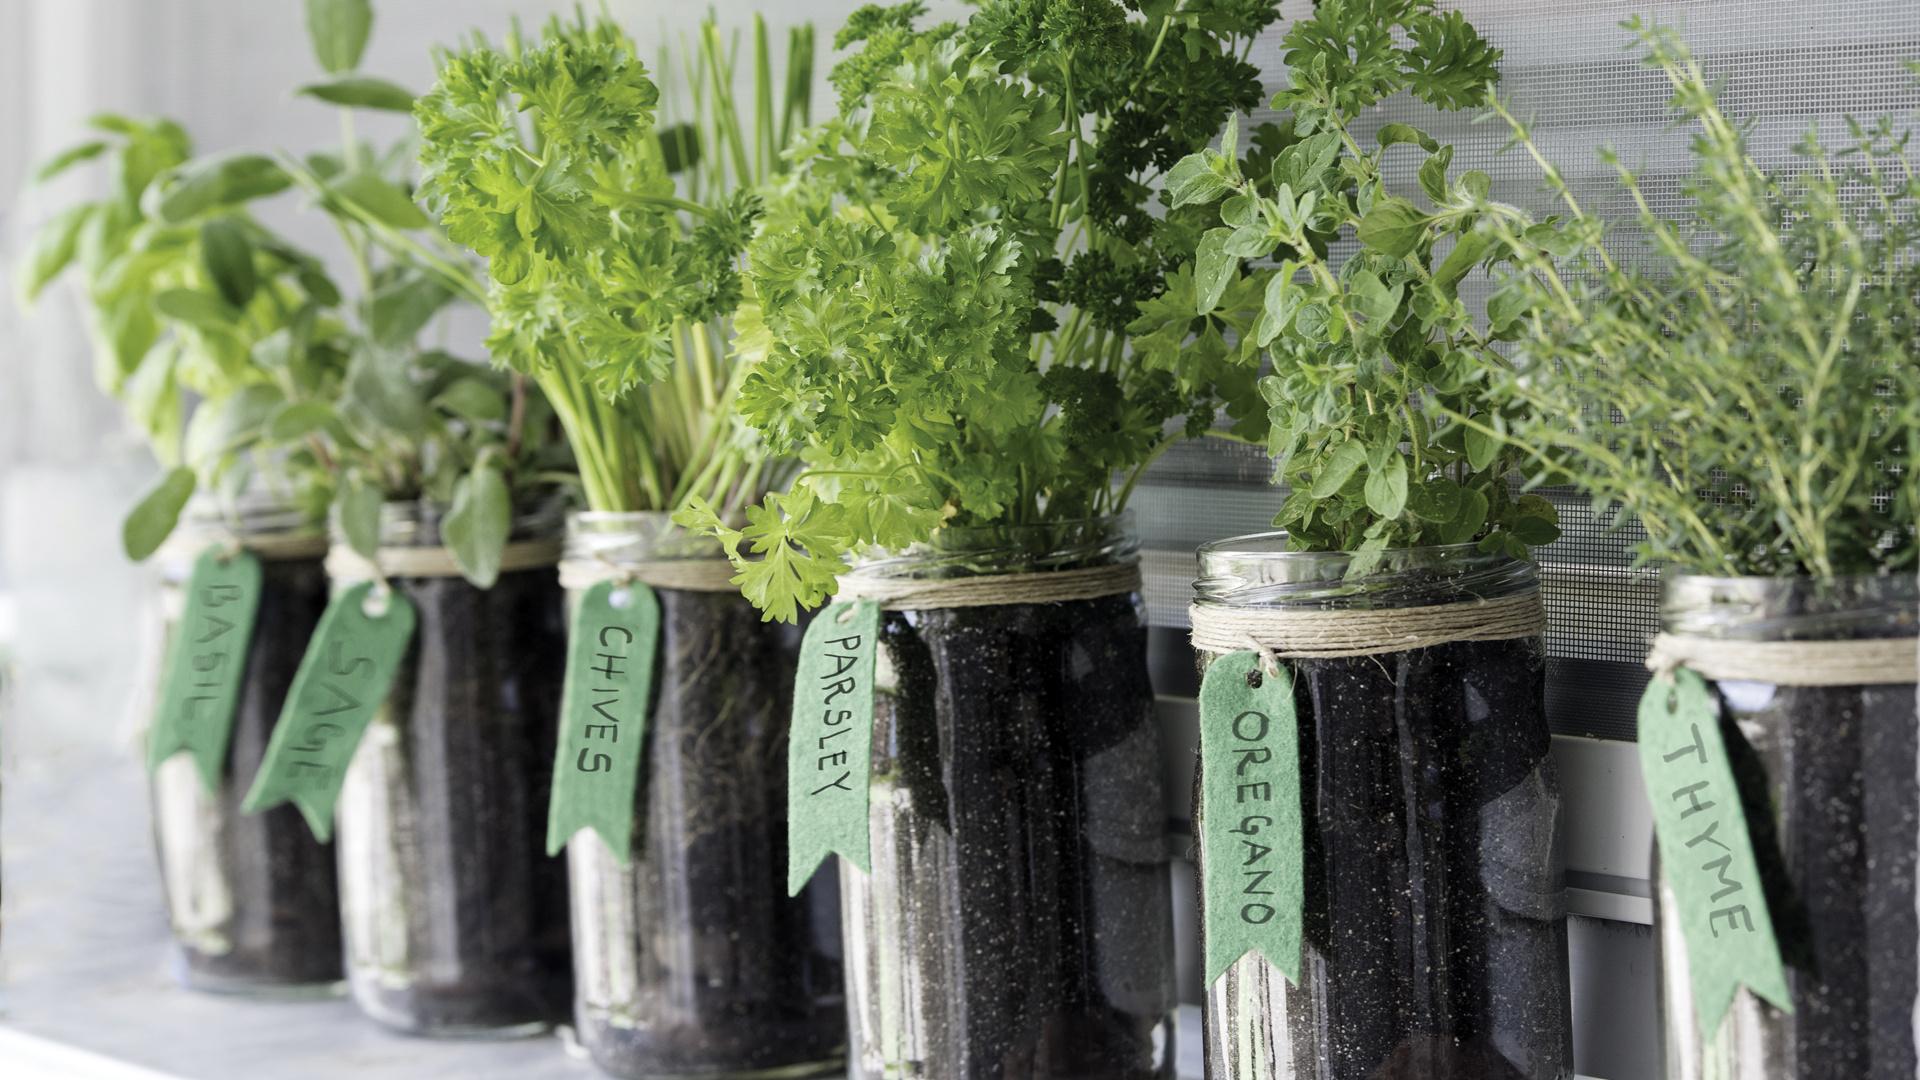 Gardening for beginners   Growing vegetables and herbs indoors